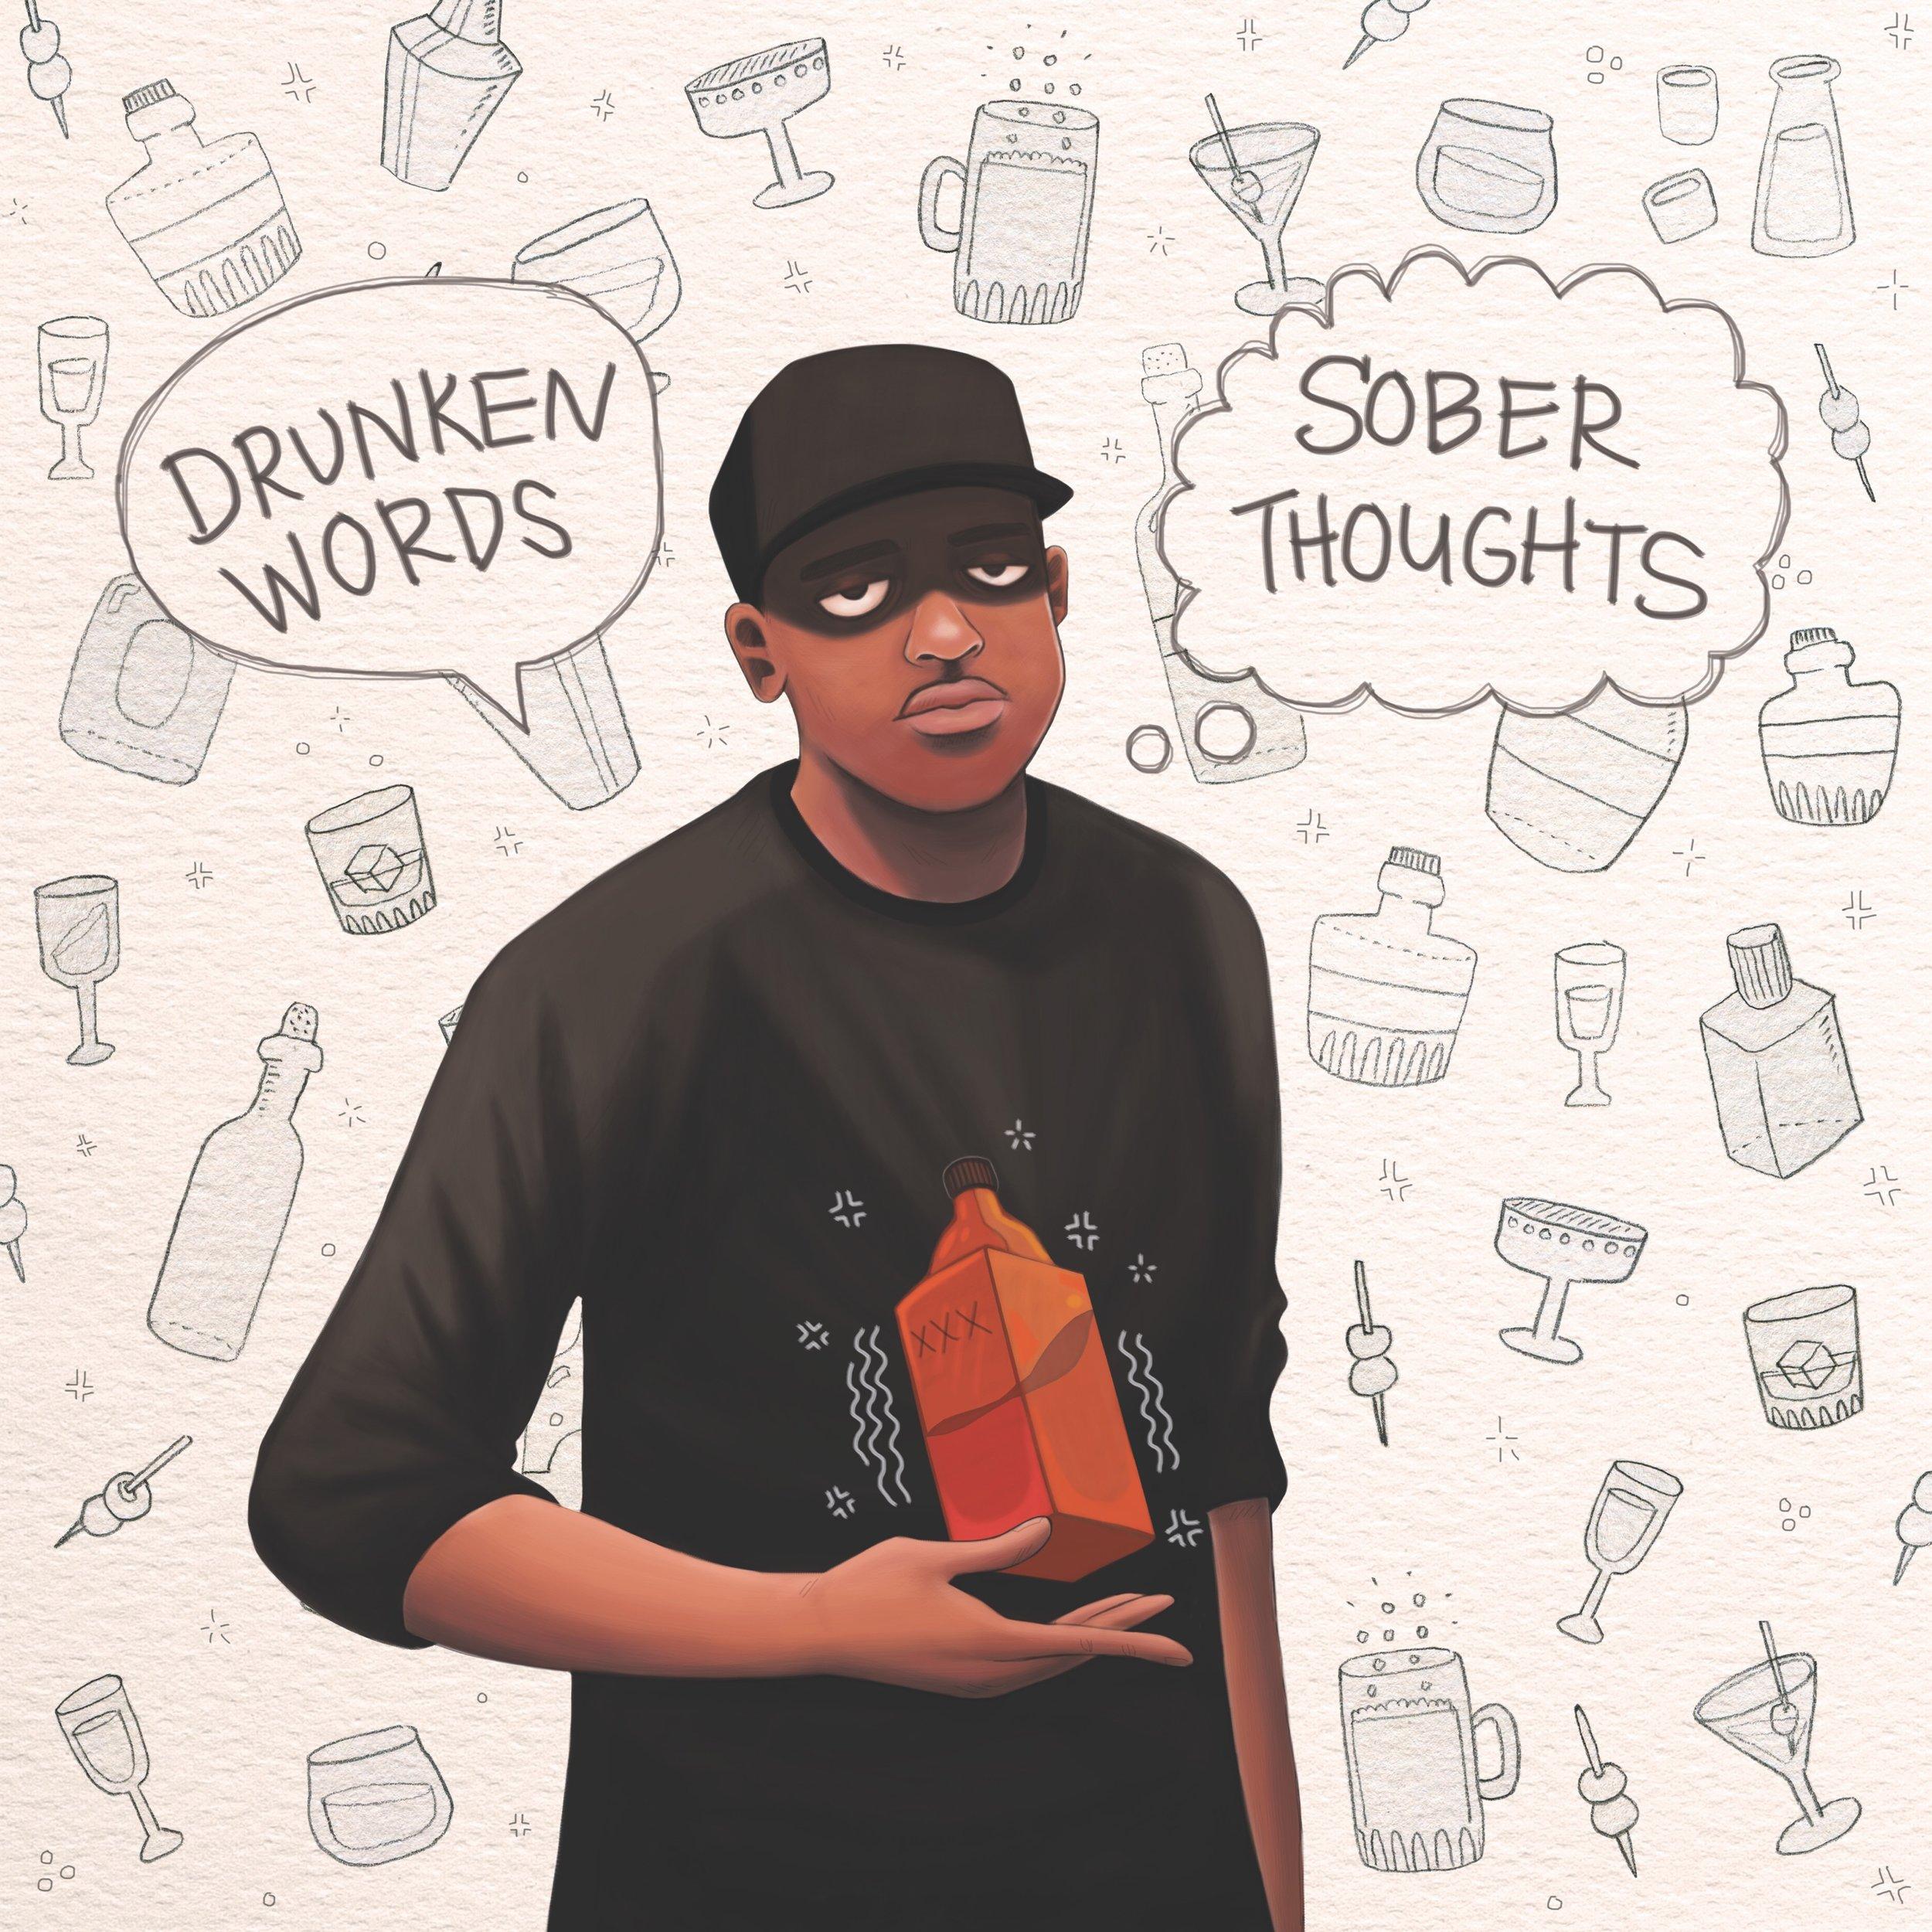 Drunken Words, Sober Thoughts